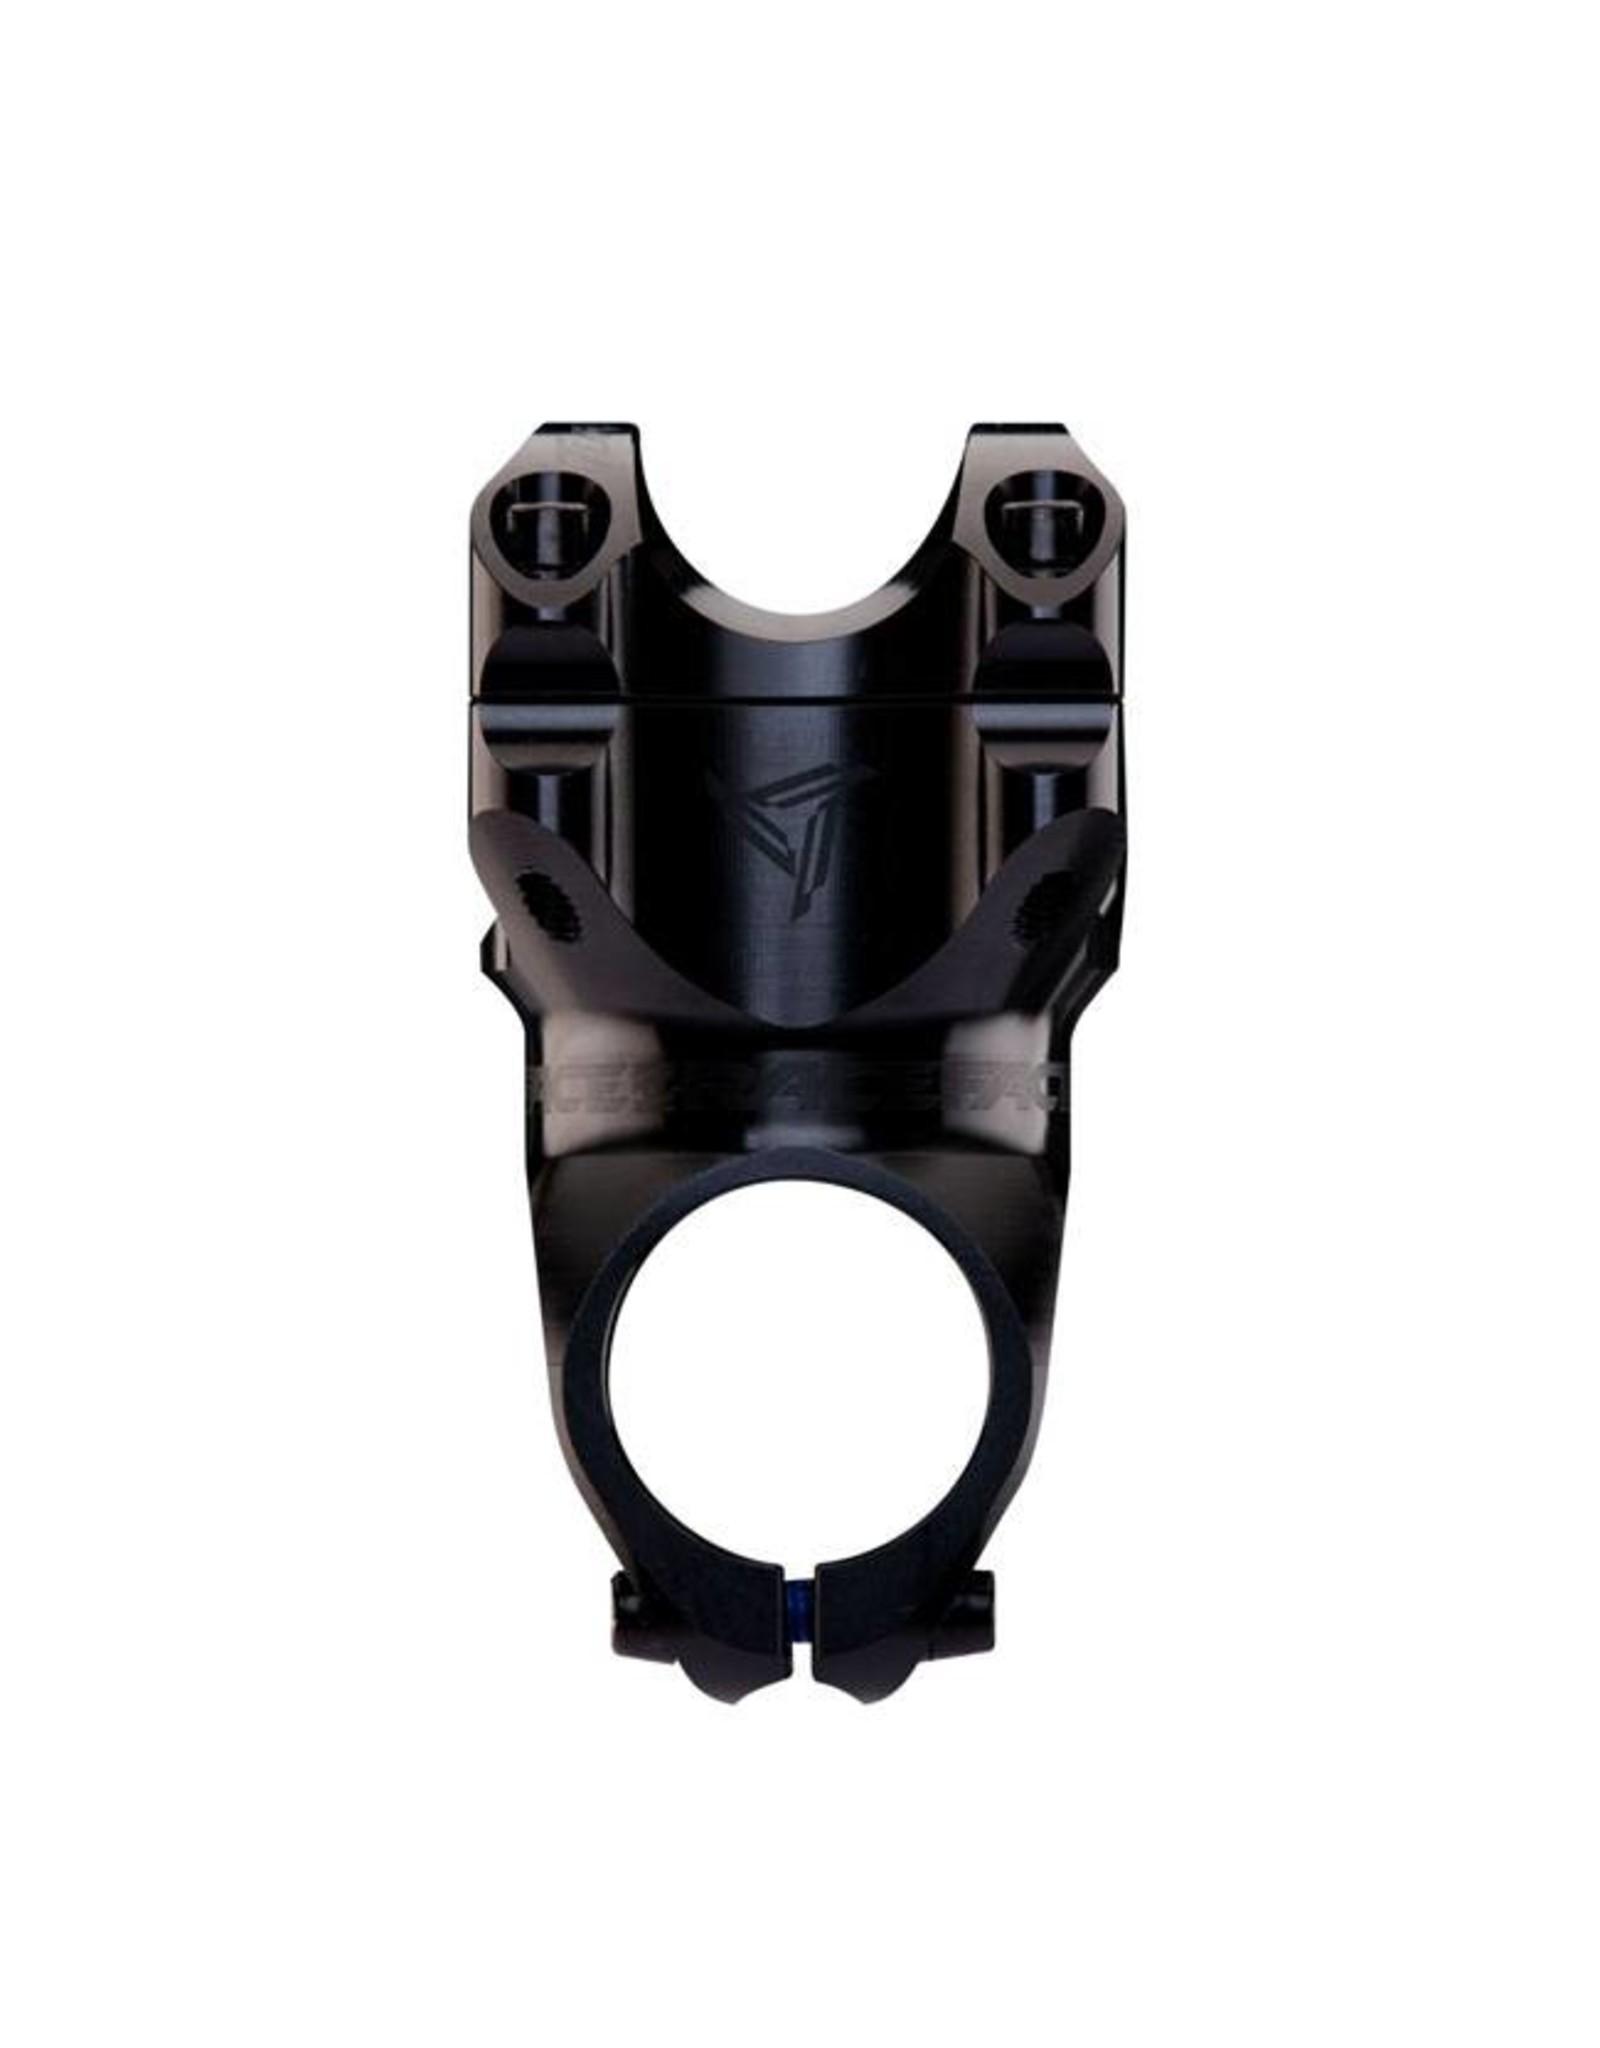 RaceFace RaceFace Turbine R 35 Stem: 32mm x 35 +/- 0 degree, Black